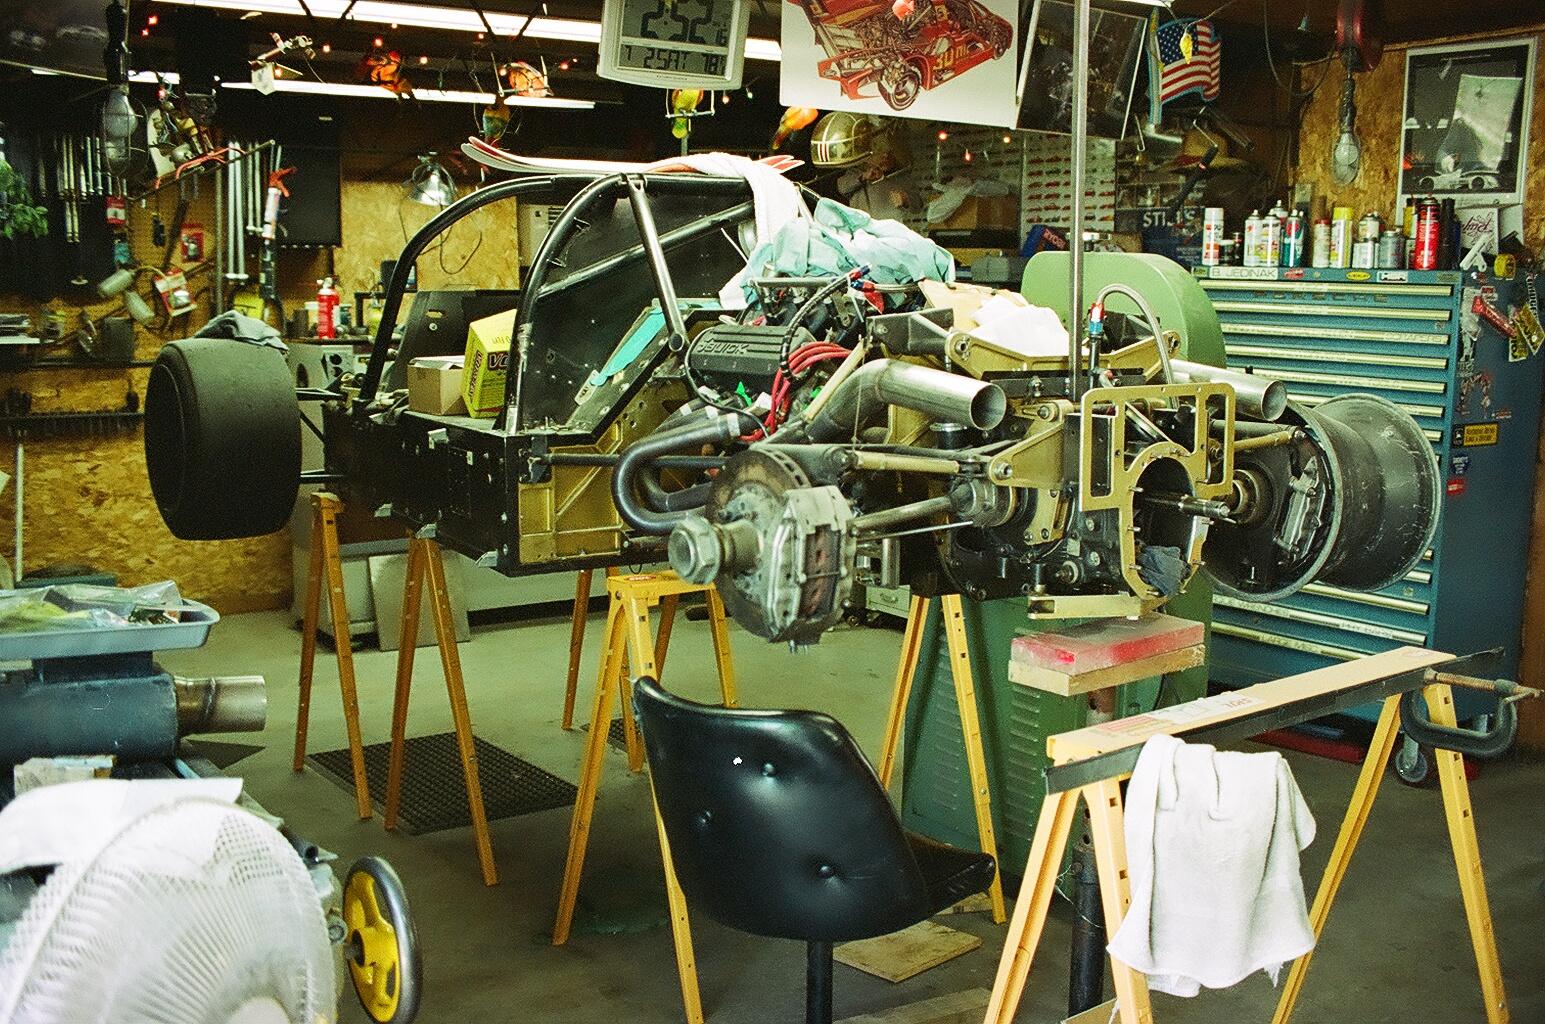 1984 Alba GTP AR3-001 ex MOMO Team car-44540025-jpg